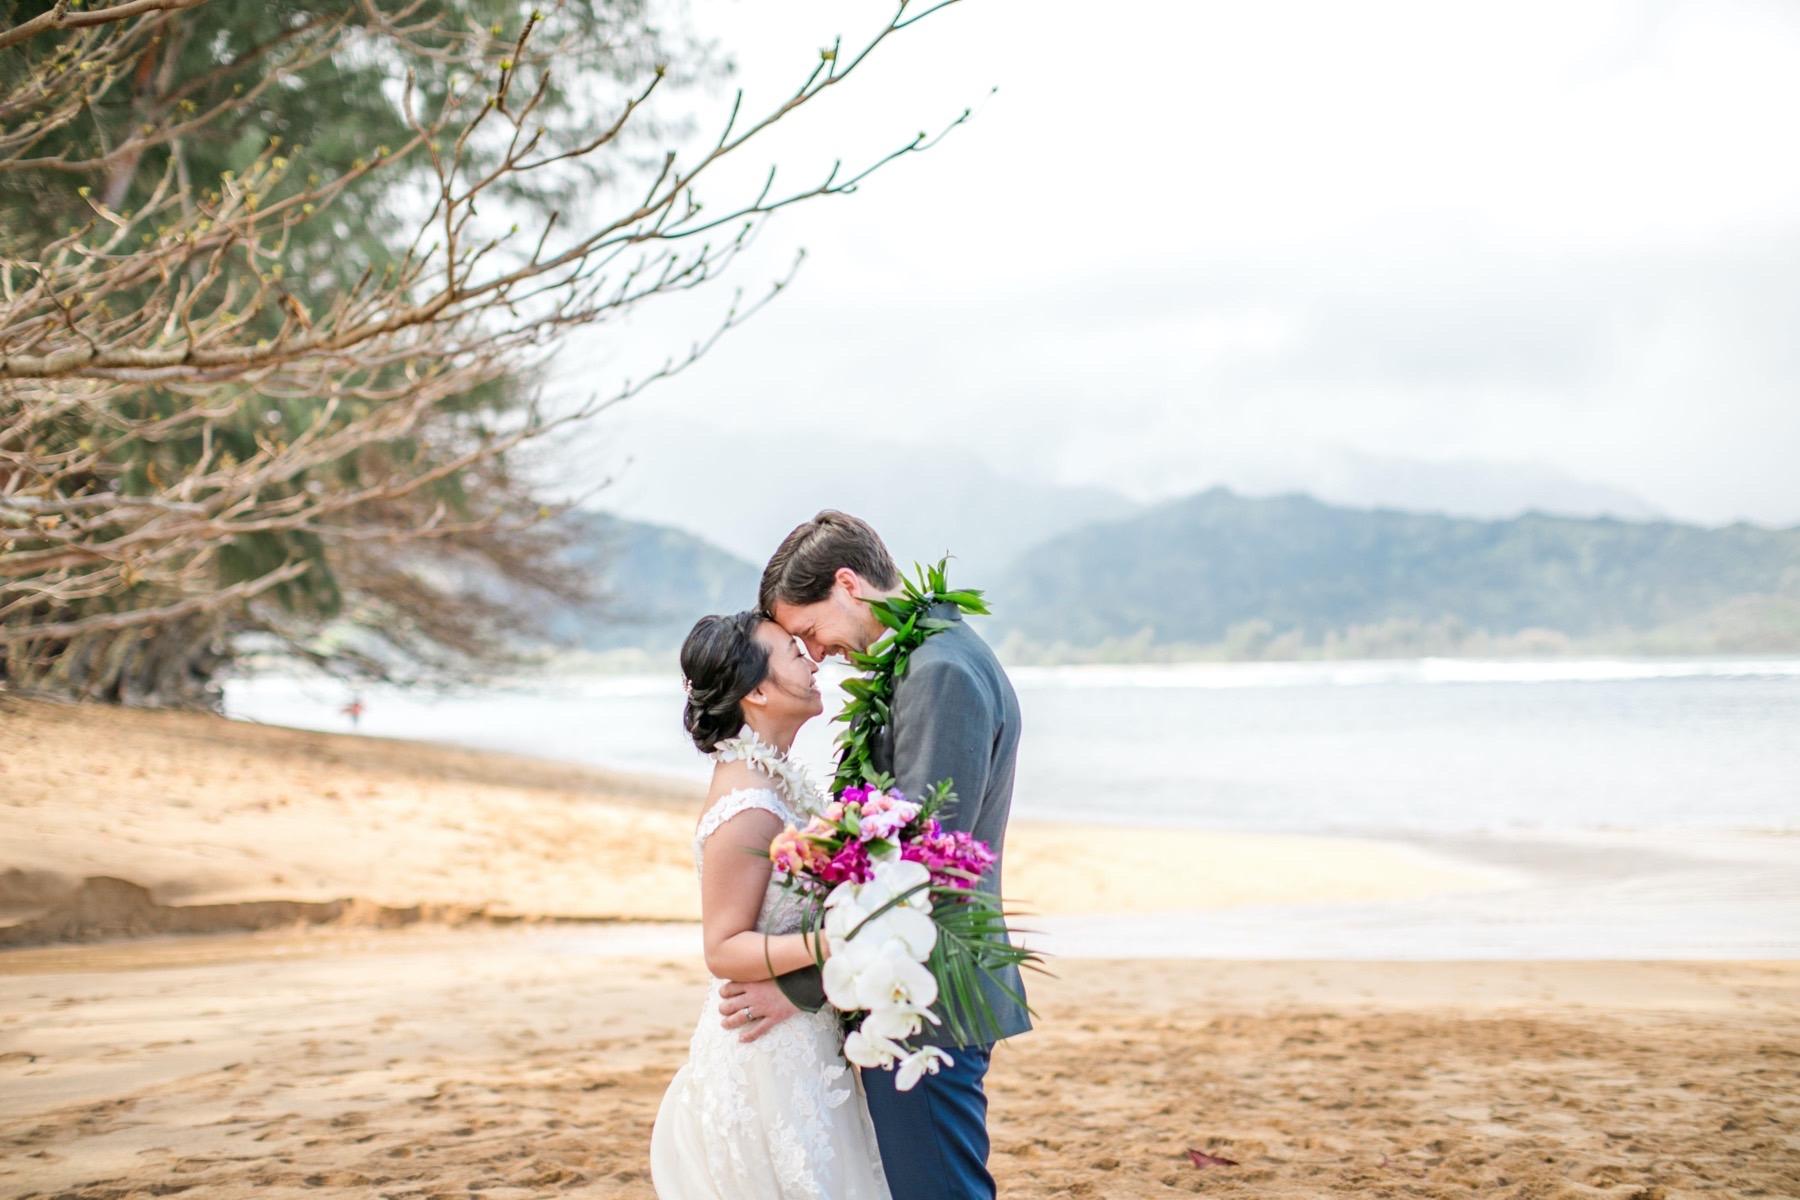 Phuong & Rob on their wedding day.